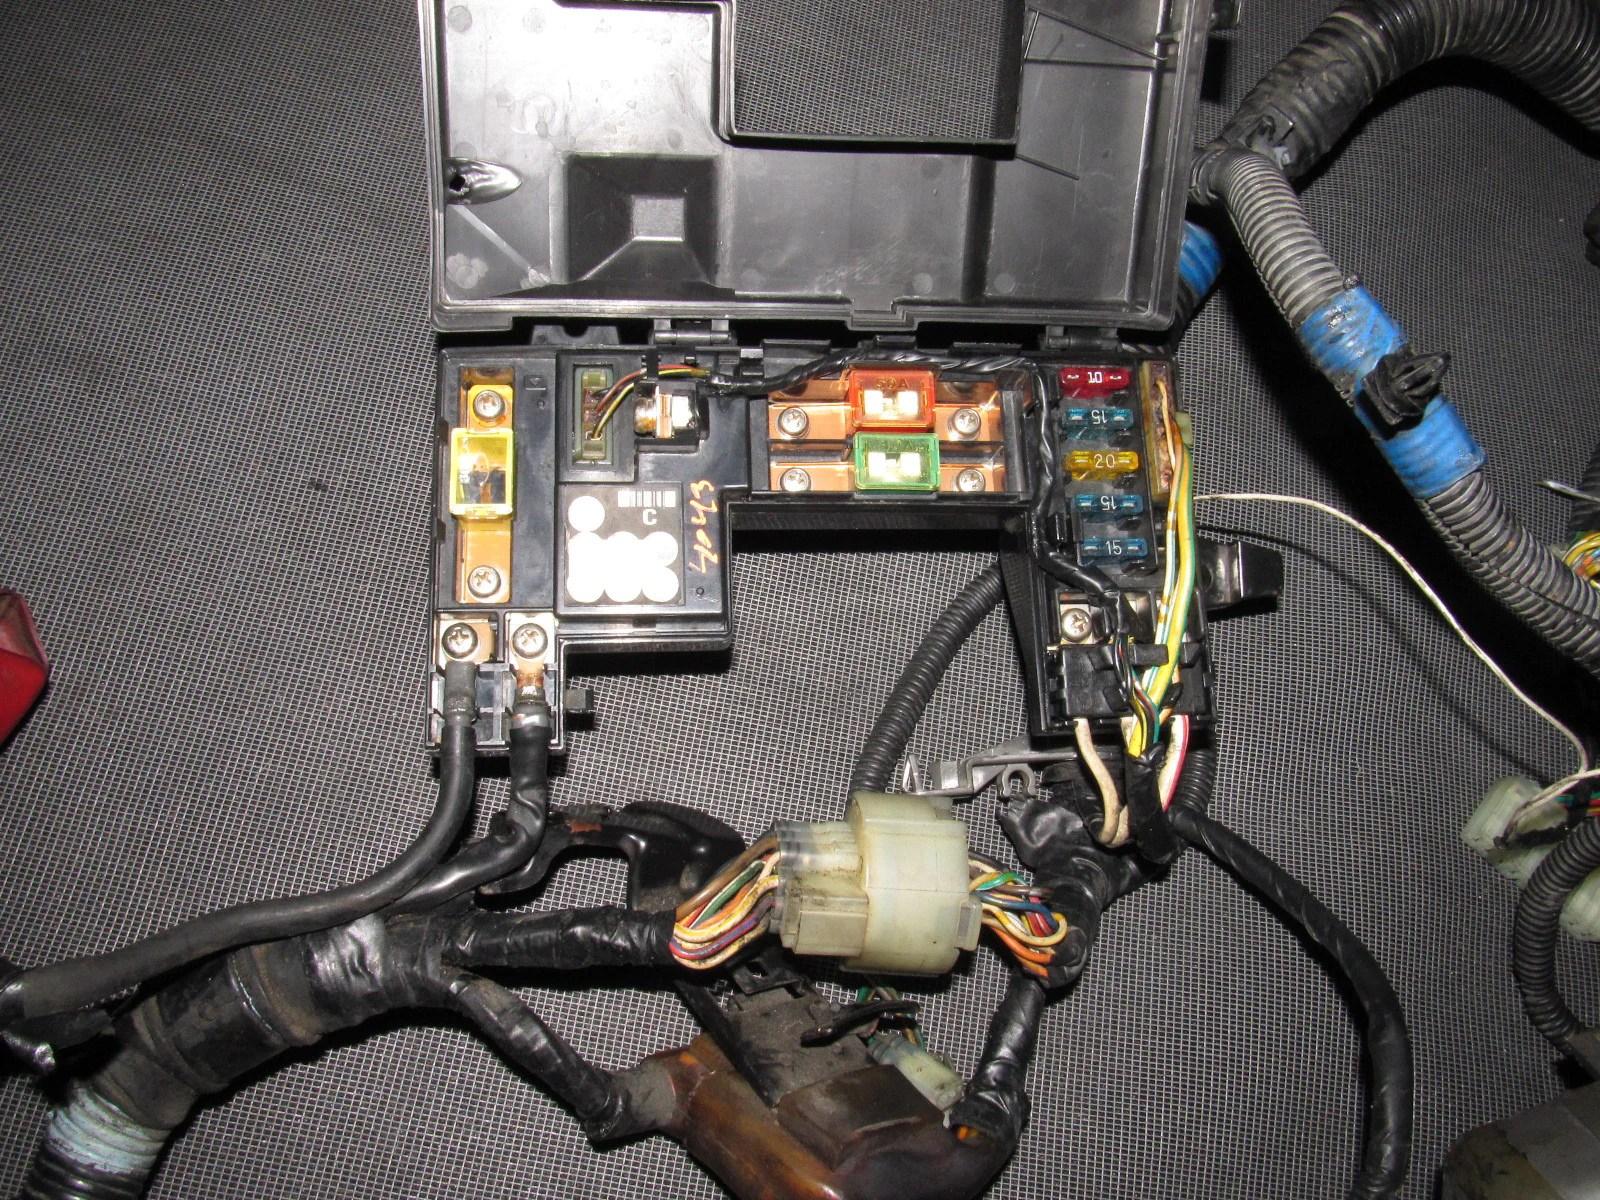 hight resolution of 88 89 honda crx oem d15b2 engine wiring harness autopartone com eclipse wiring harness honda crx wiring harness